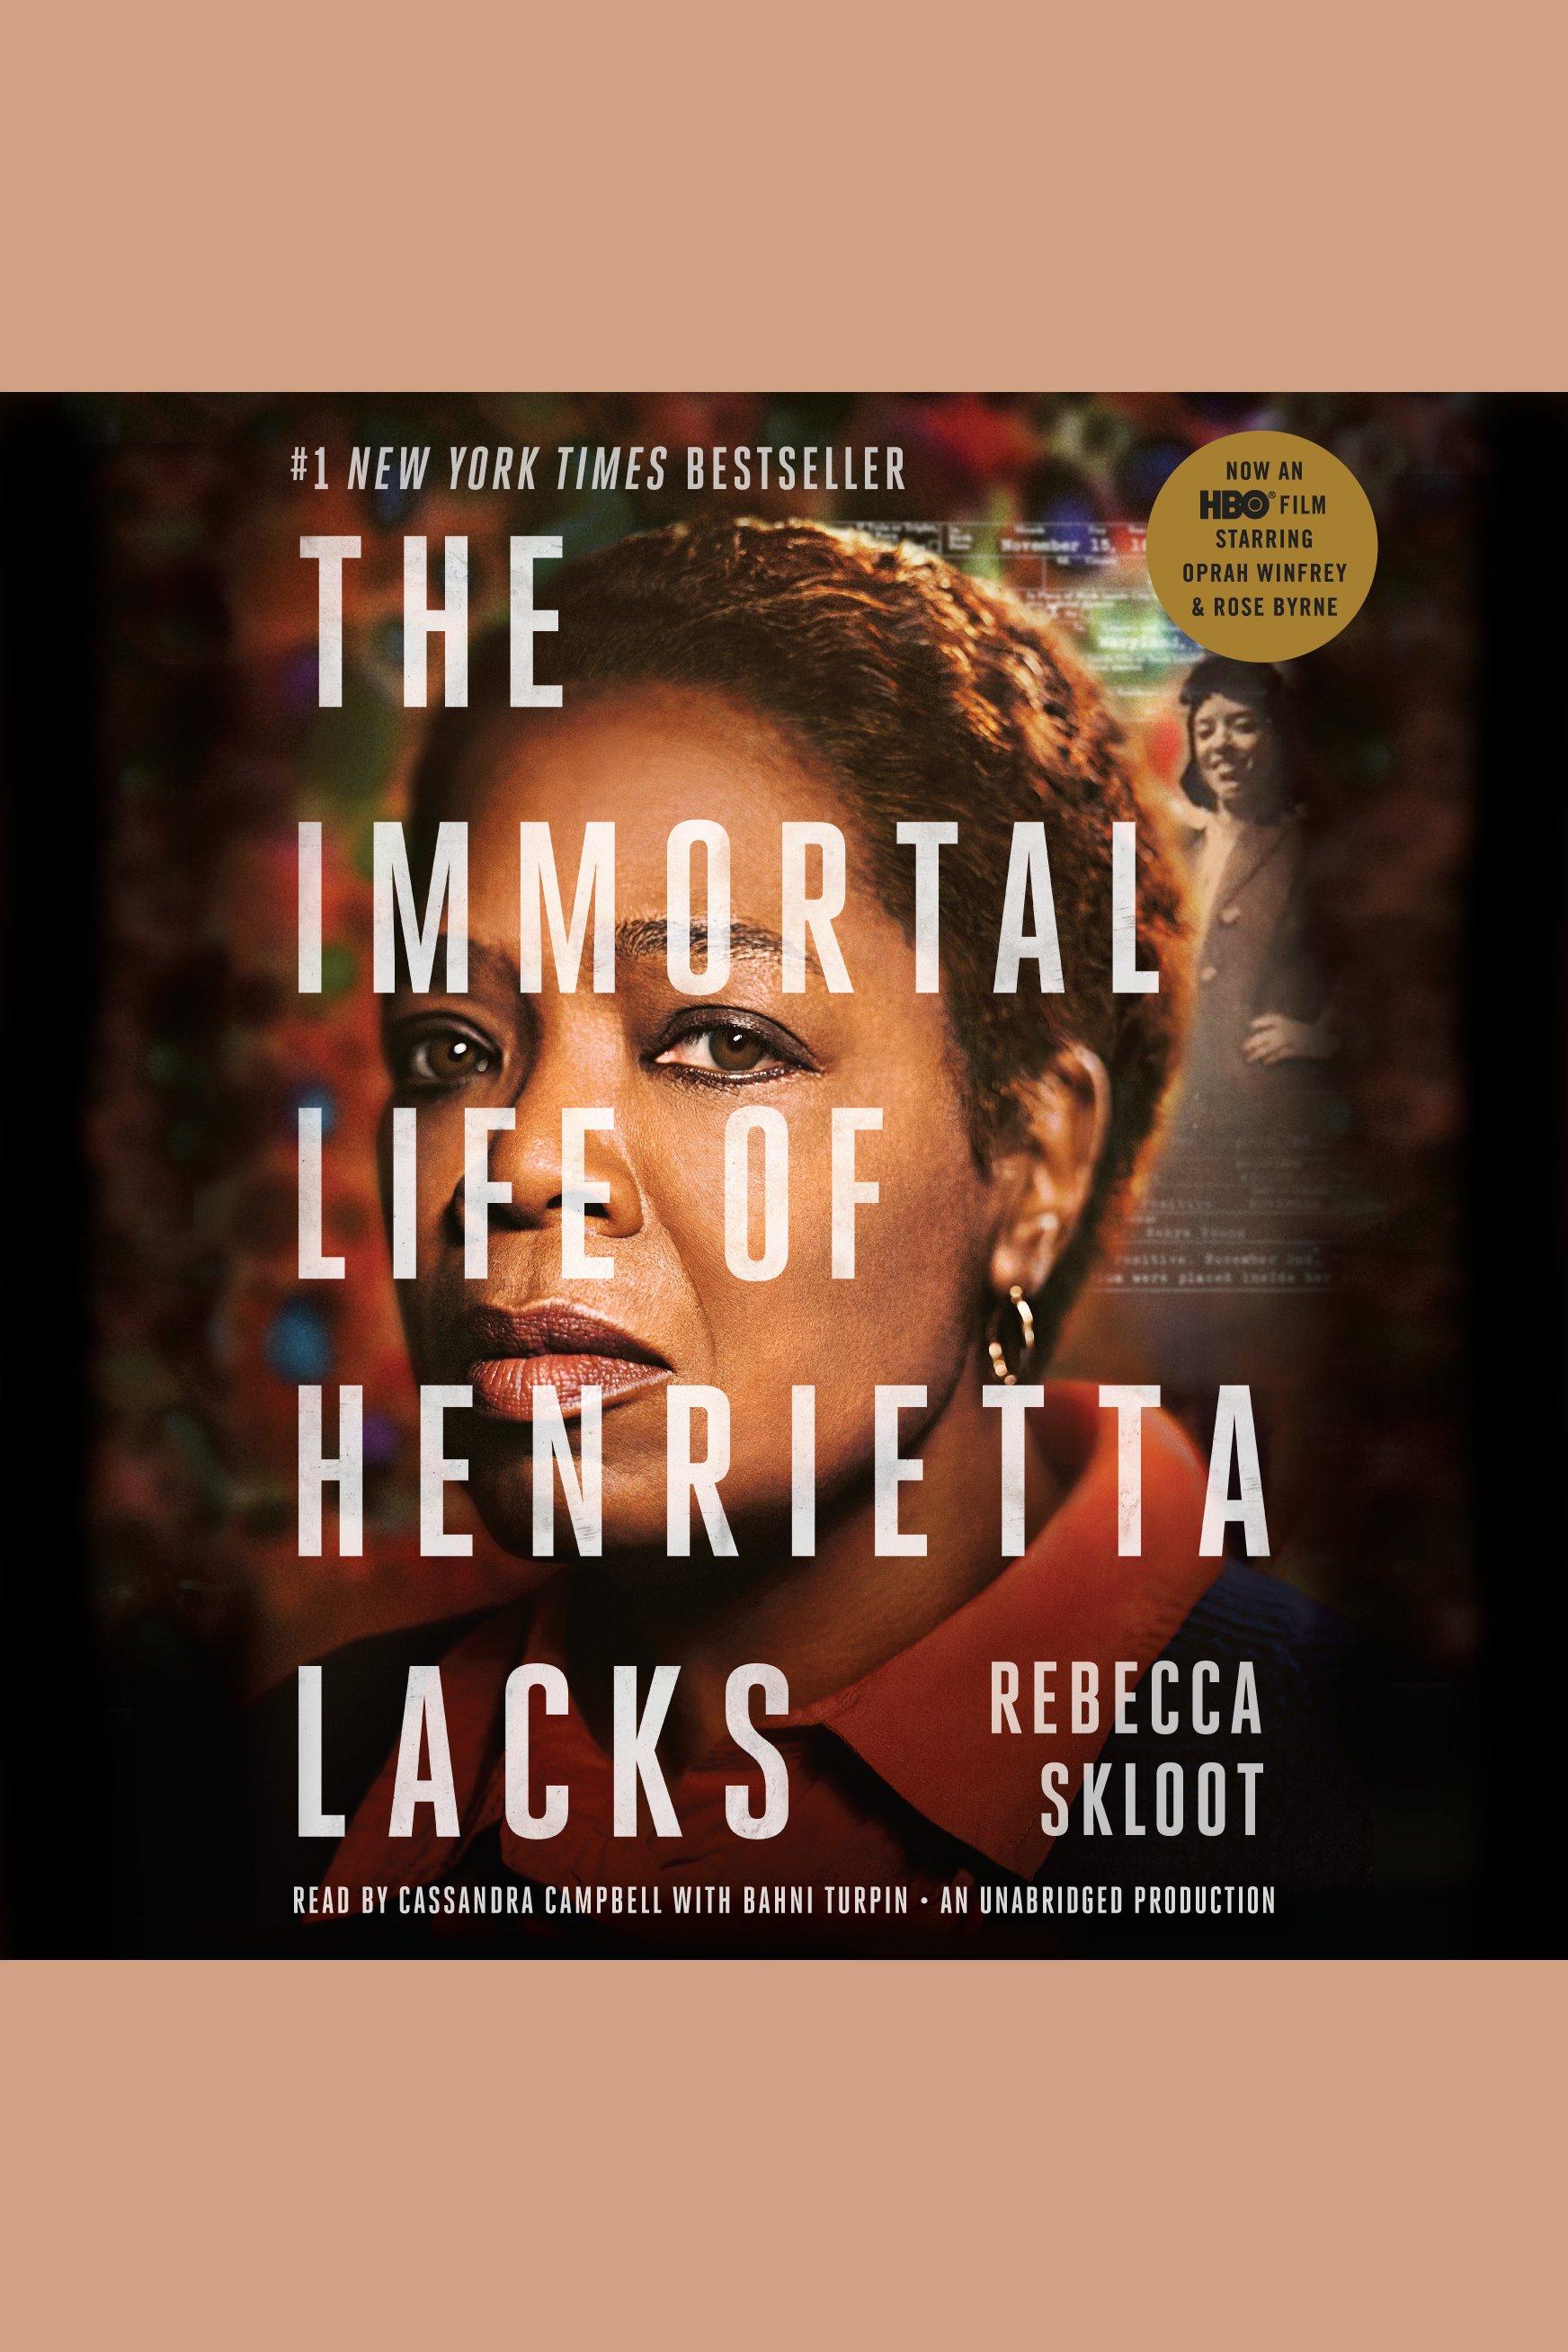 Cover Image of The Immortal Life of Henrietta Lacks